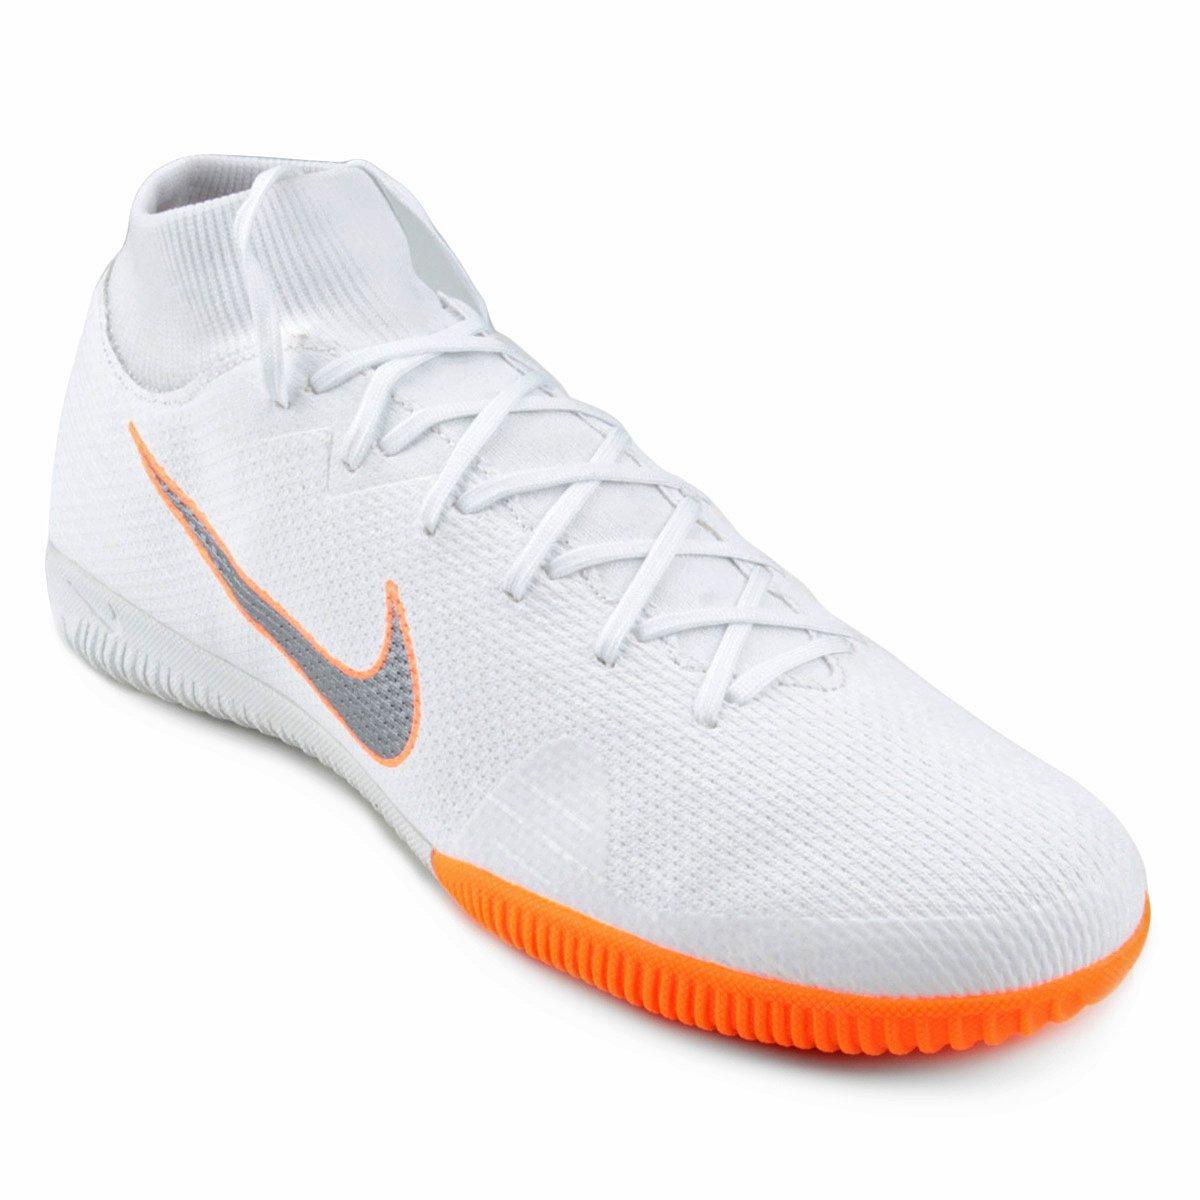 Chuteira Futsal Nike Mercurial Superfly 6 Academy - Branco e Cinza ... d269d0c3d85e6